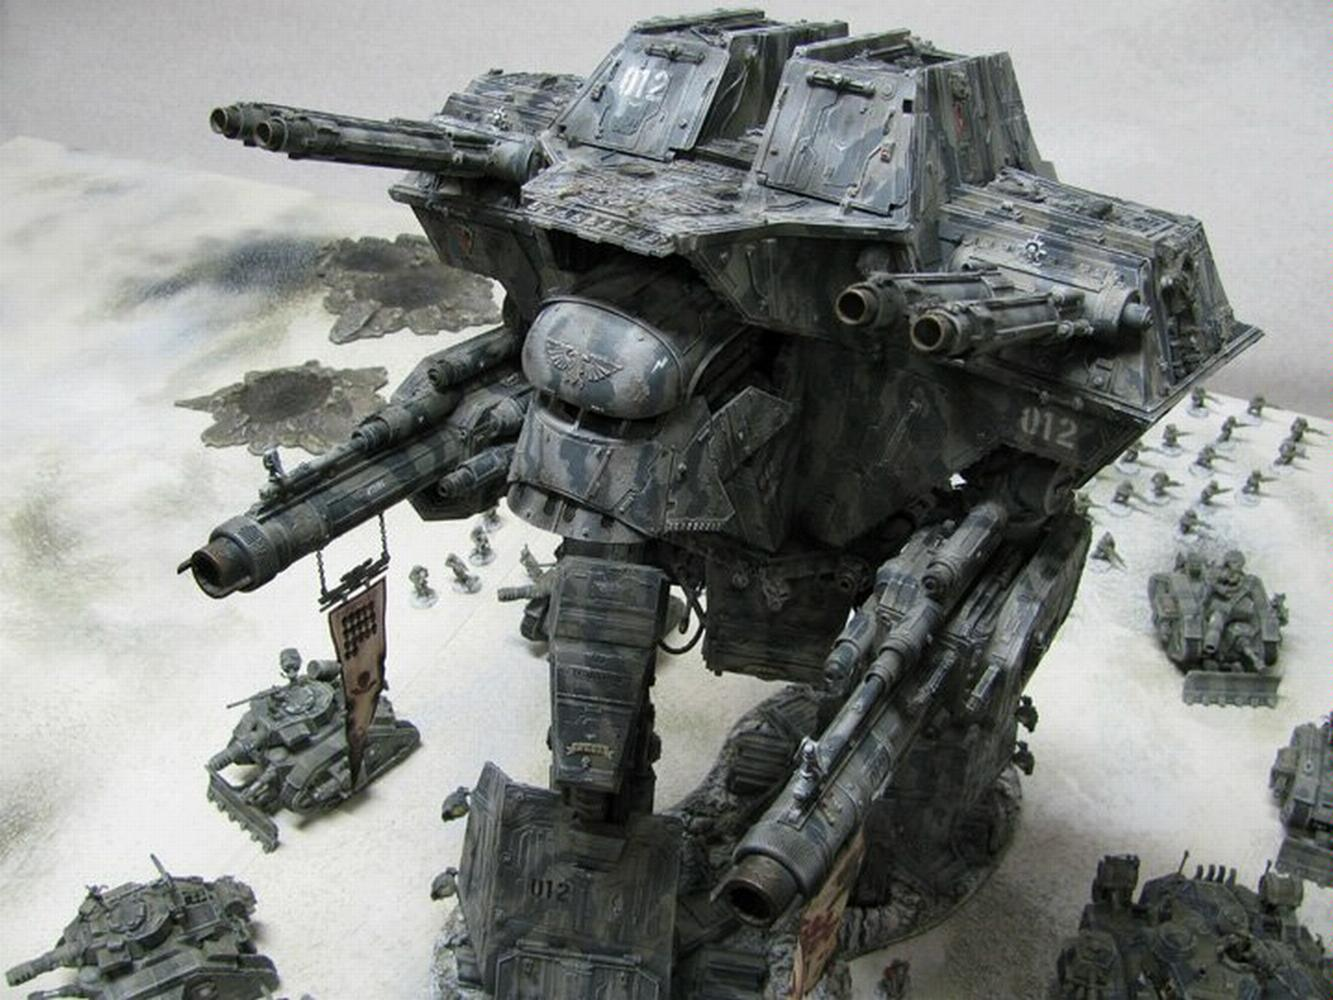 Apocalypse, Imperiel Guard, Titan, Warhammer 40,000, Warlord